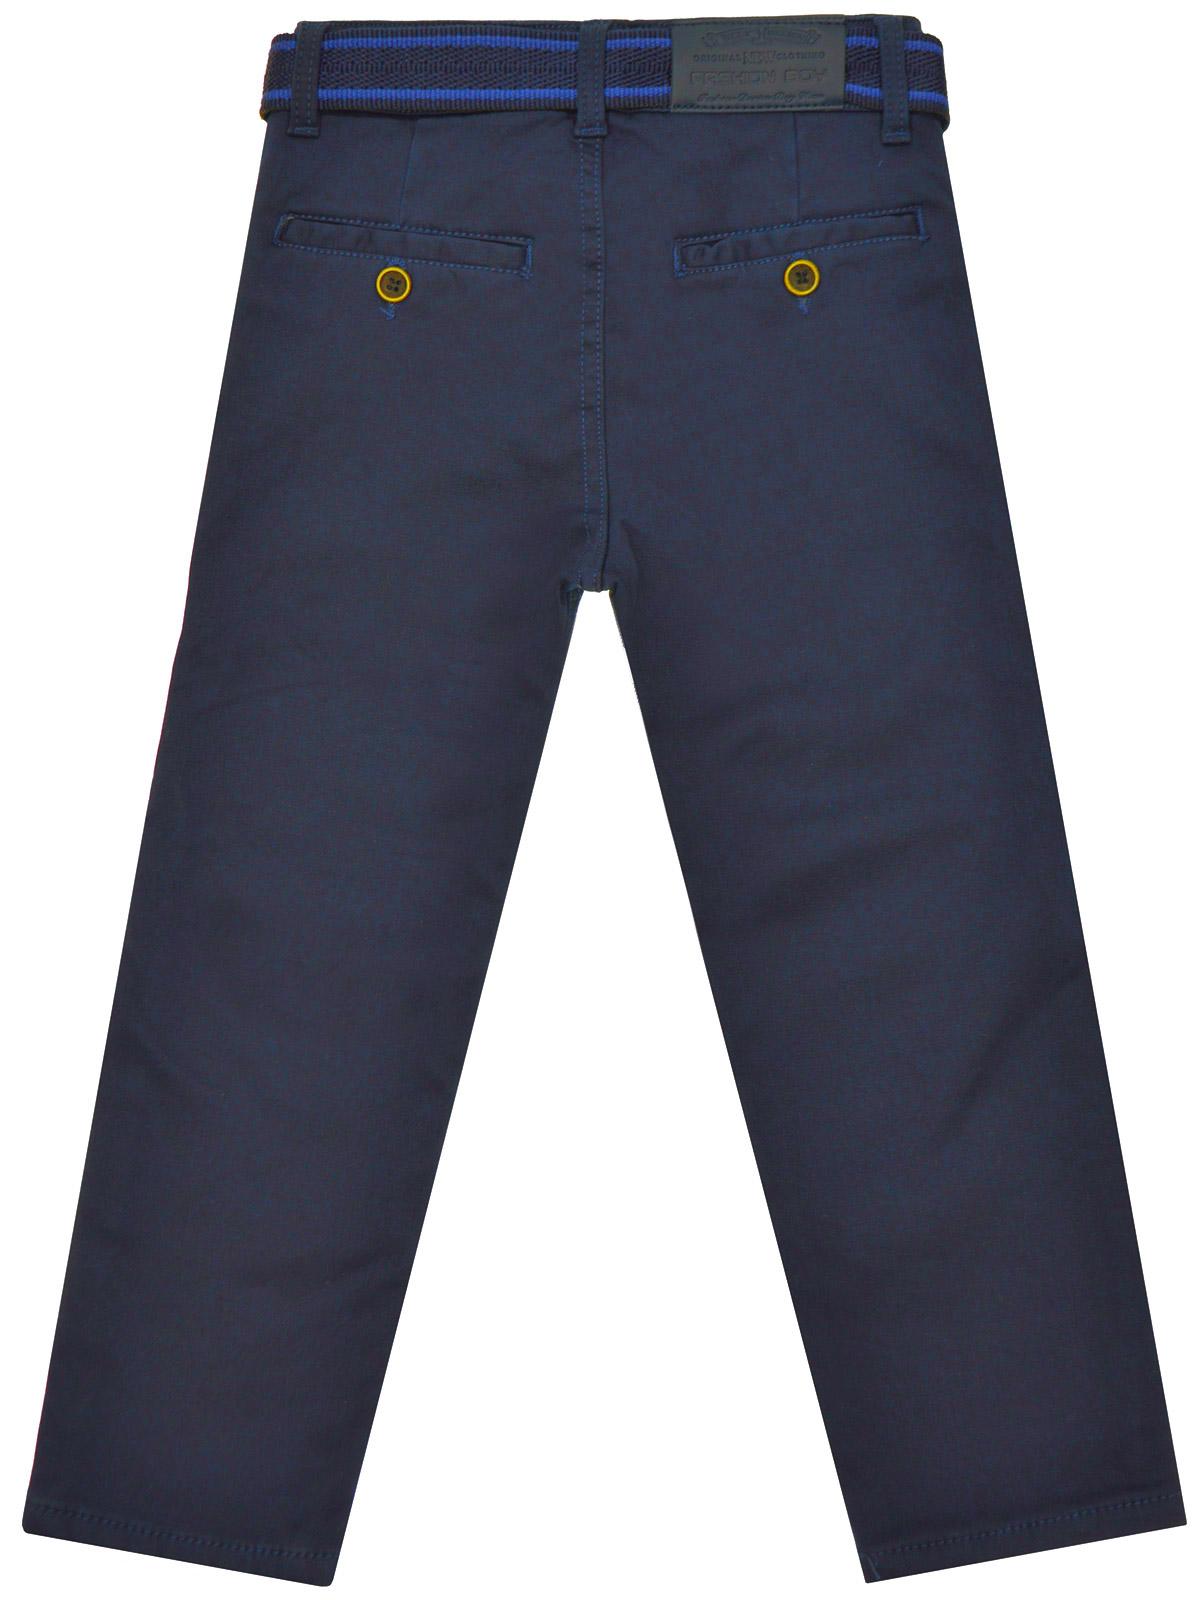 Enfants-Chino-THERMO-d-039-hiver-Pantalons-Garcons-Pantalon-Doublure-Stretch-Reglable-22904 miniature 3